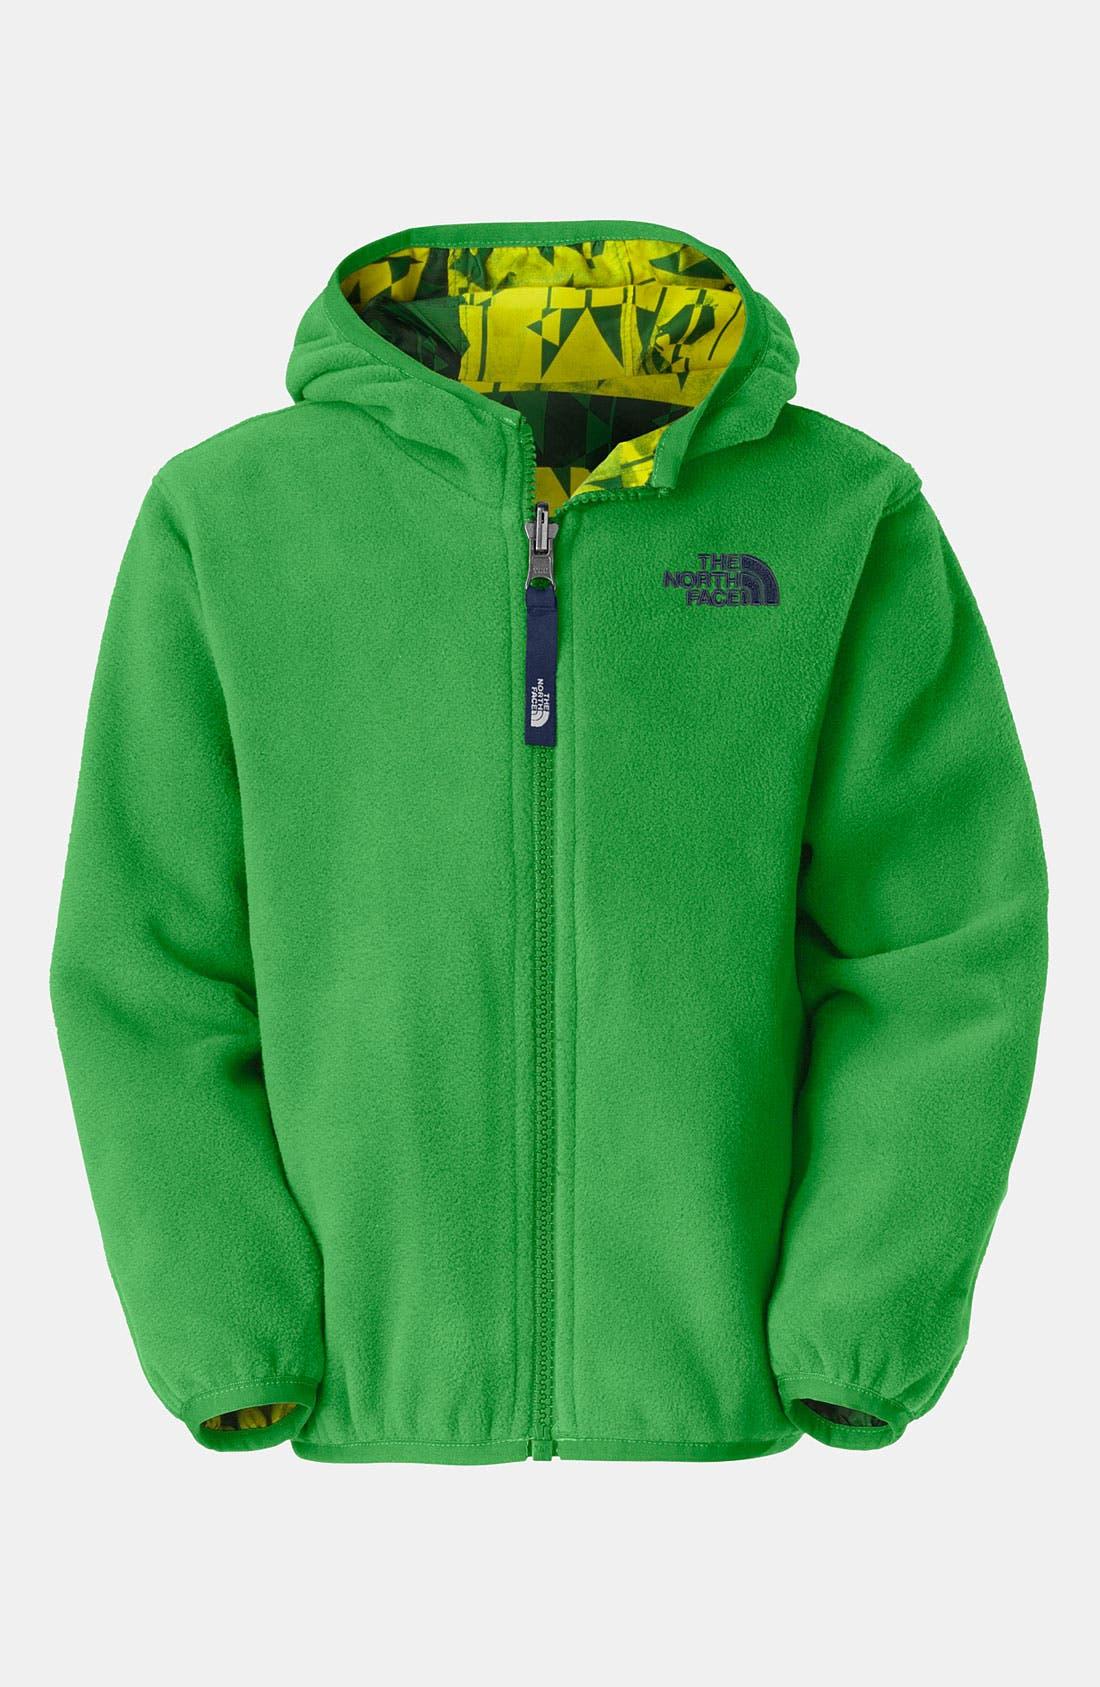 Main Image - The North Face 'Holografix' Reversible Wind Jacket (Toddler)